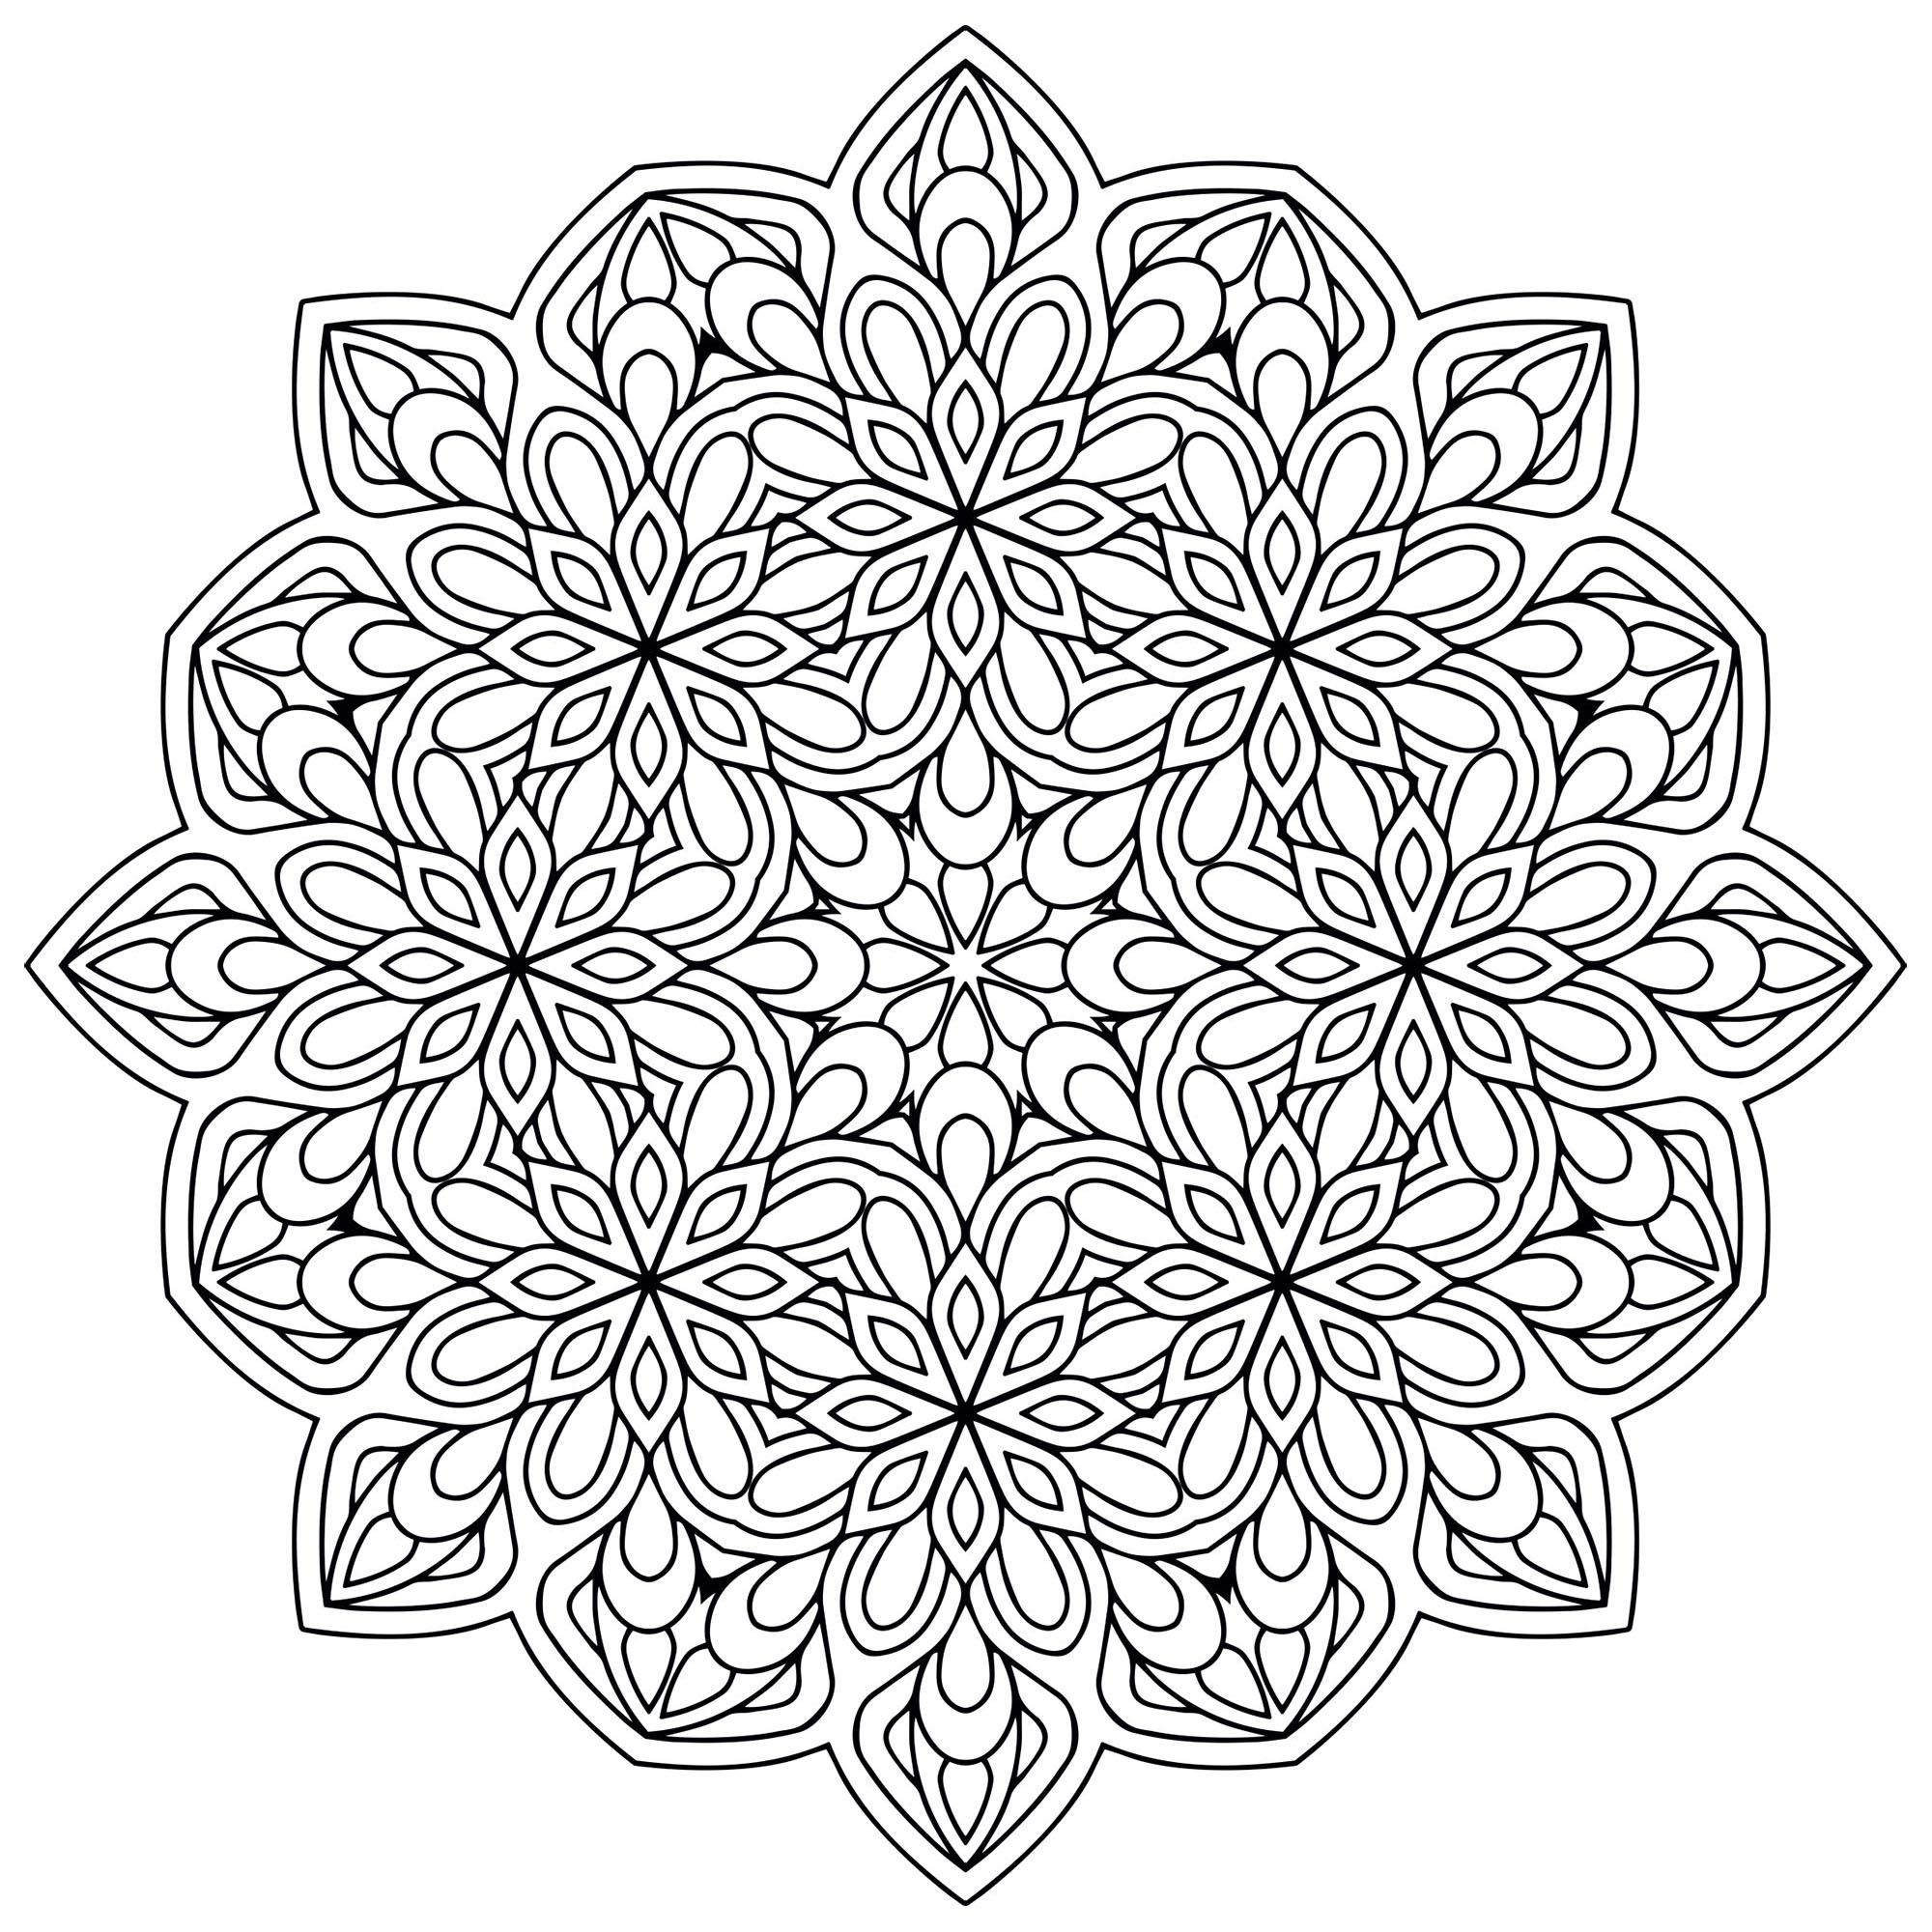 Mandala Zen Antistress 9 Mandalas Coloriages Difficiles